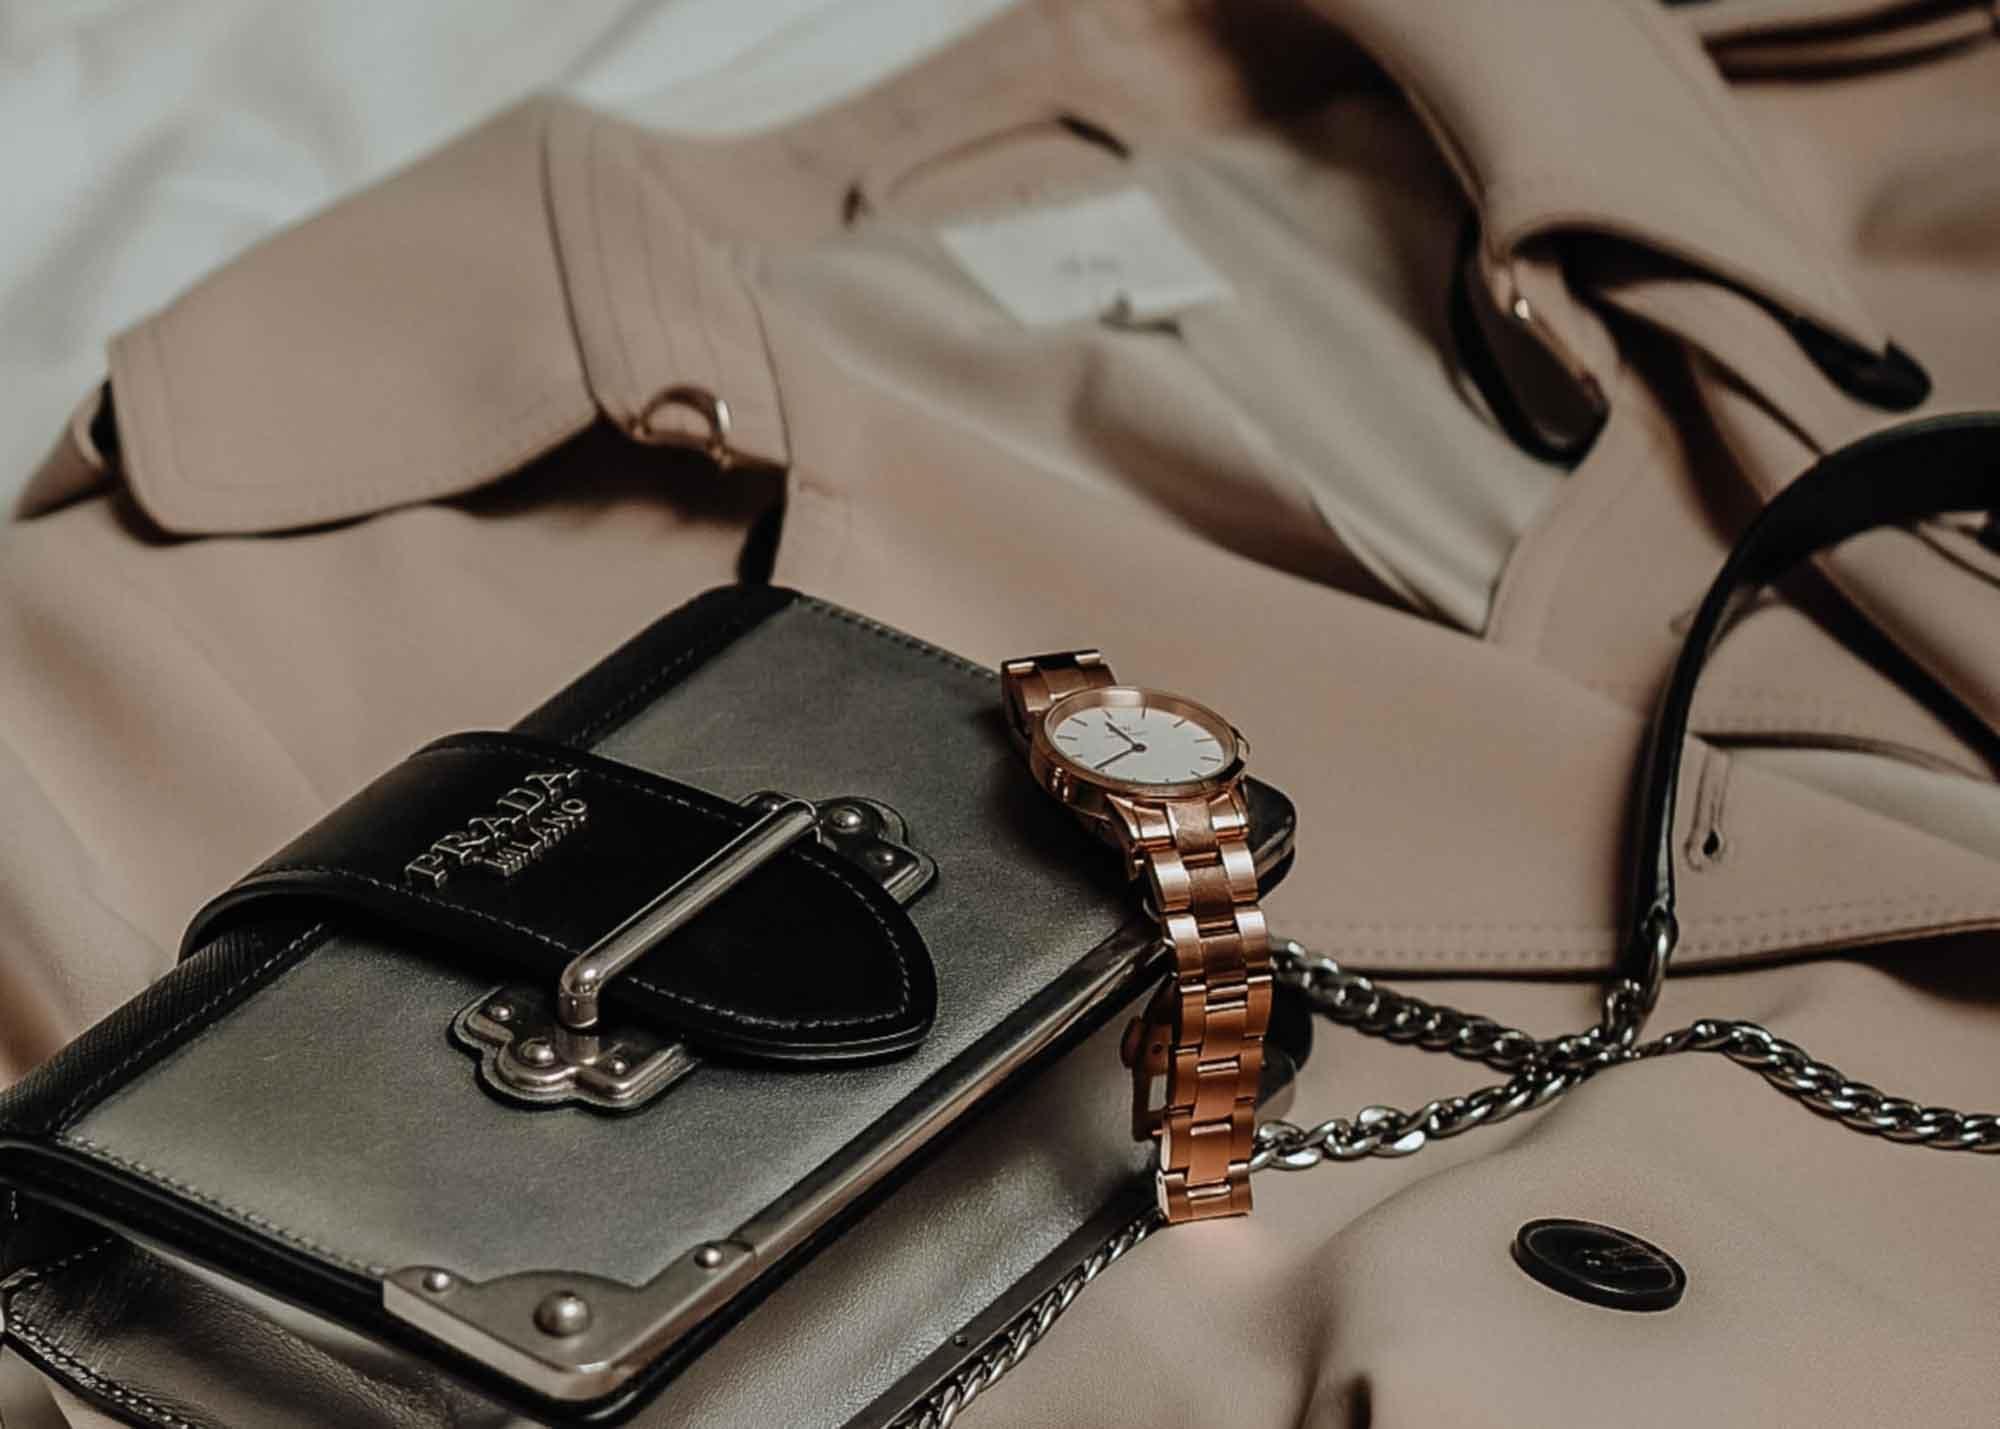 Prada bag and a nice watch